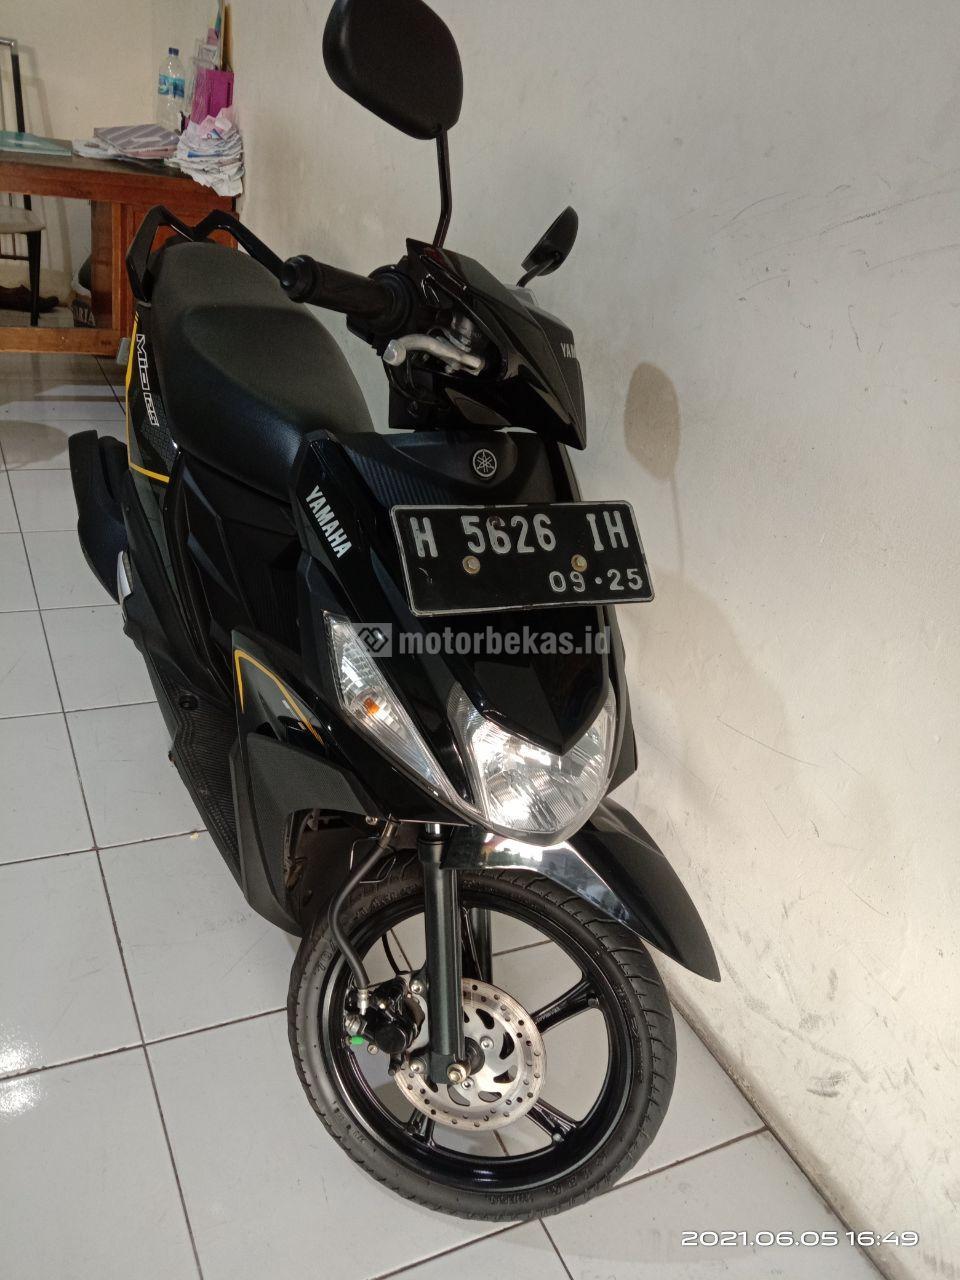 YAMAHA MIO M3 125  2230 motorbekas.id